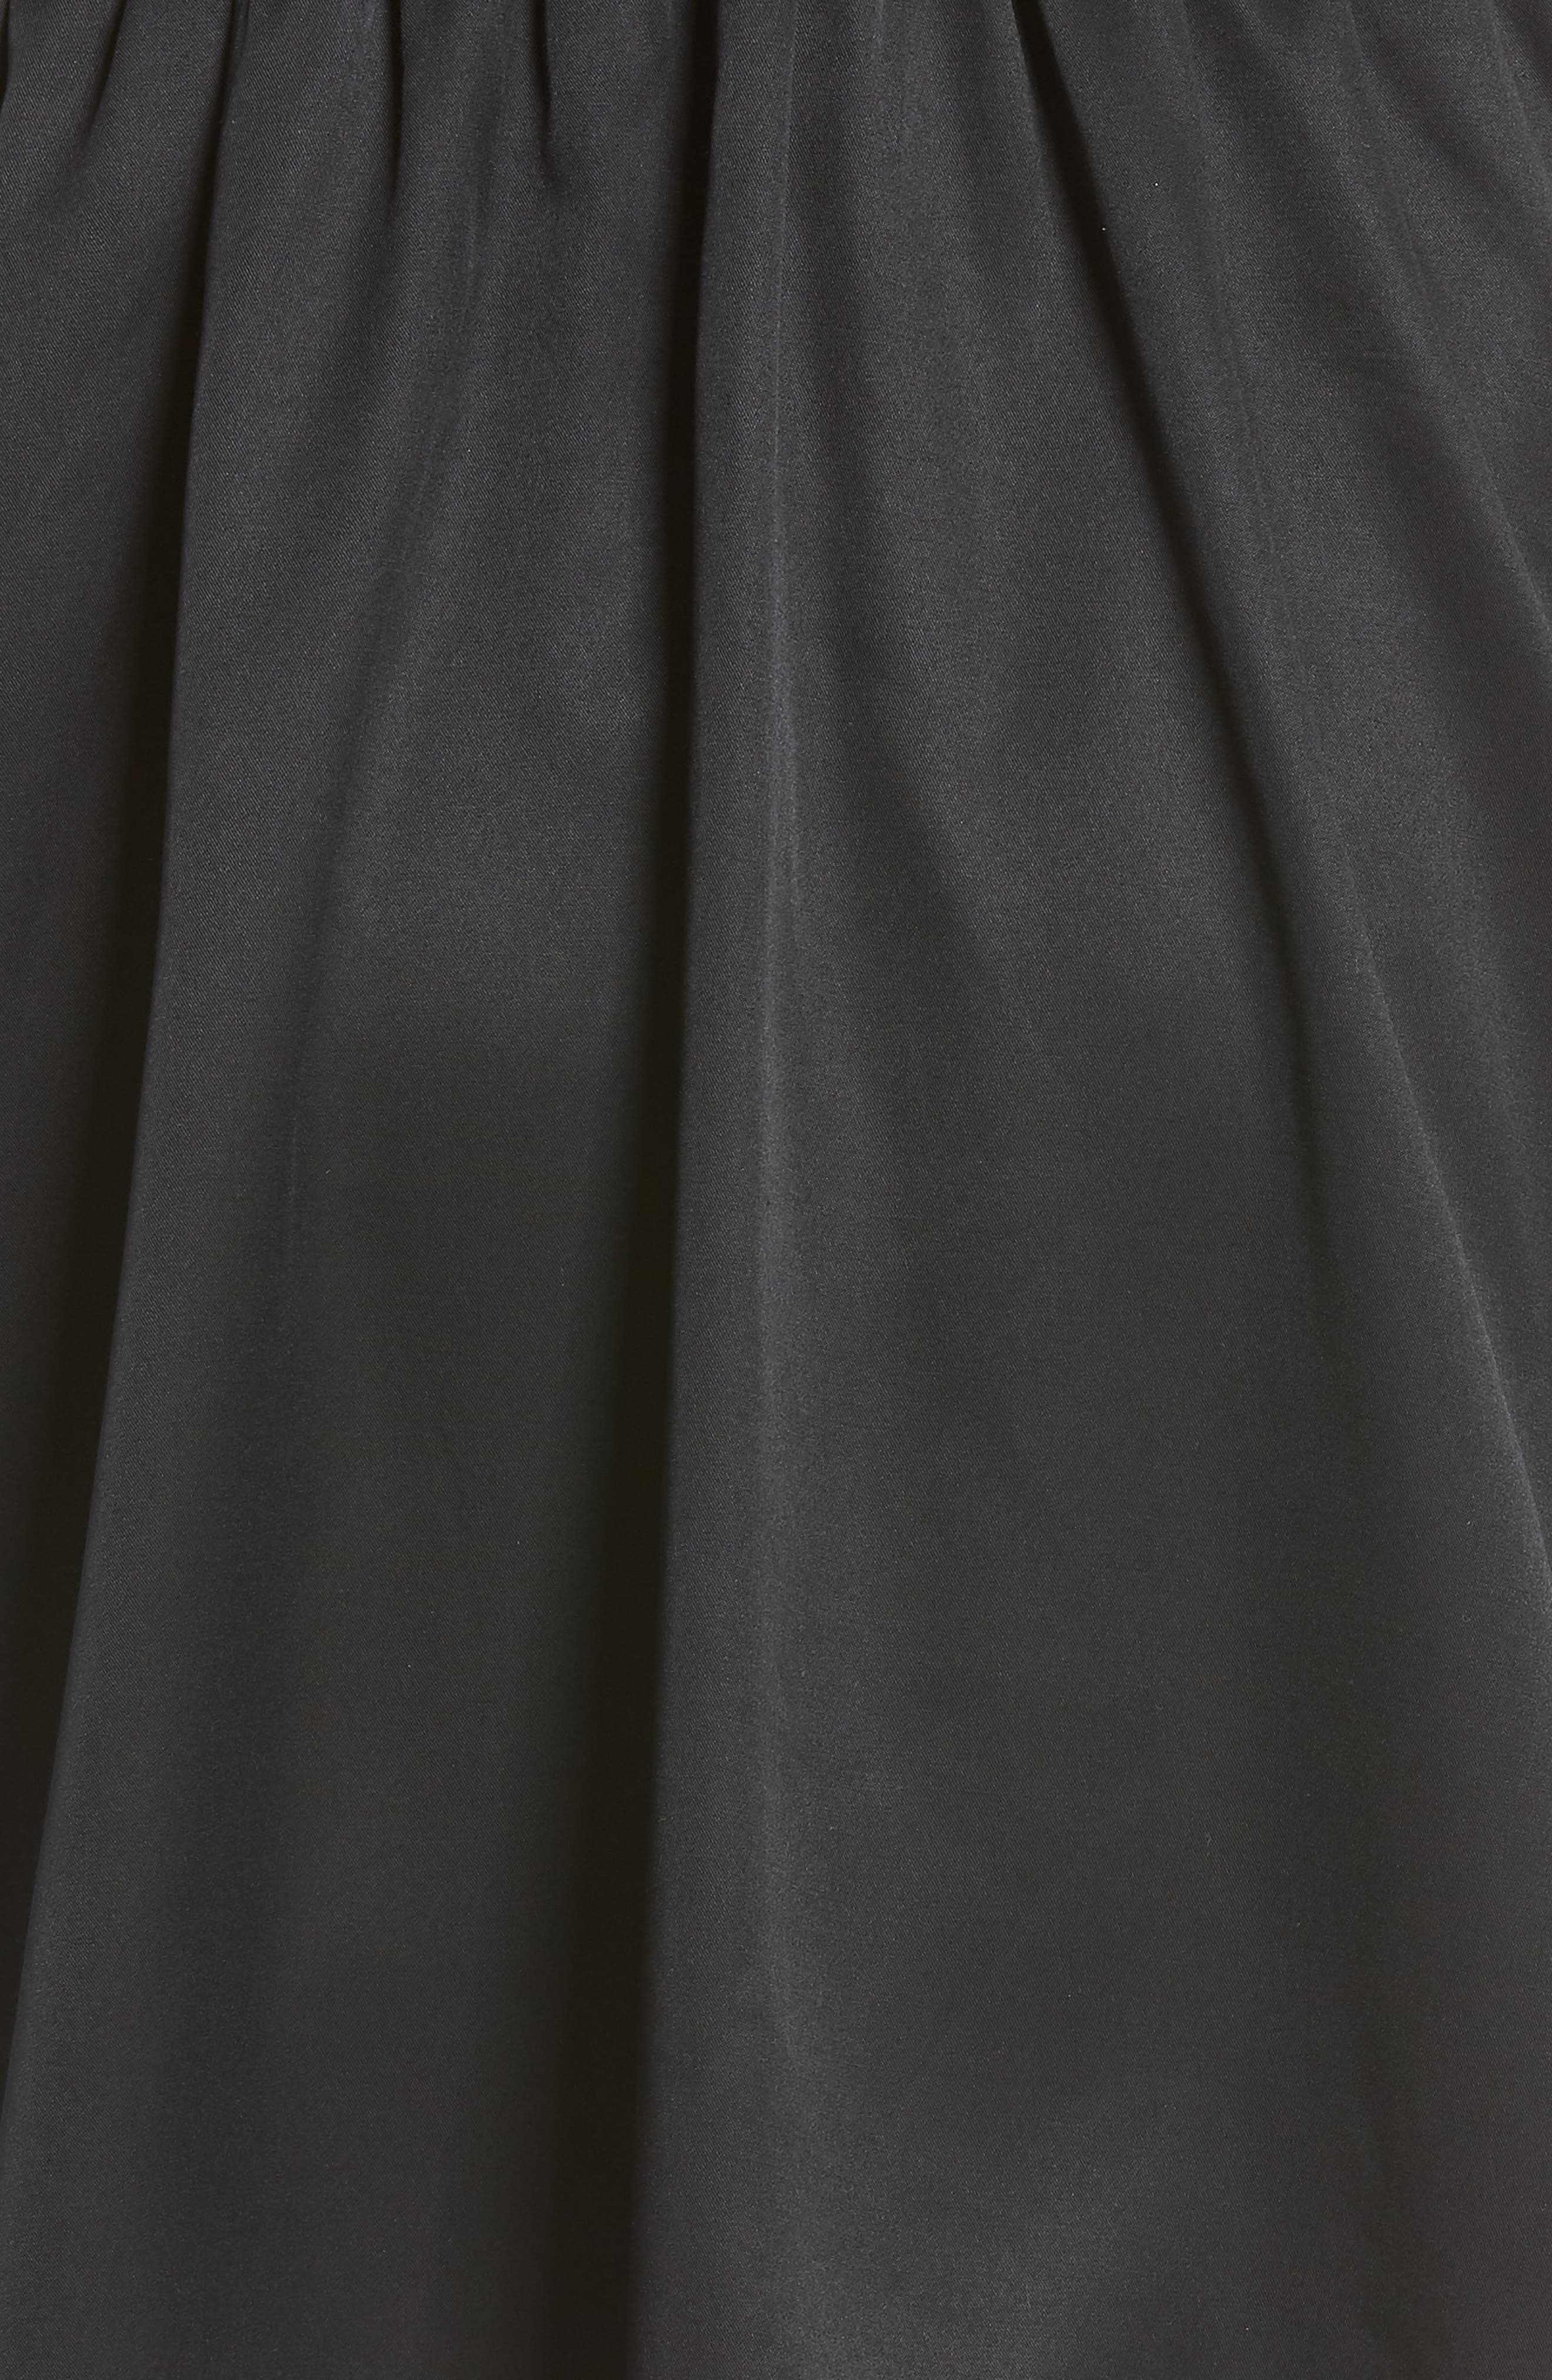 Ruffle Satin Dress,                             Alternate thumbnail 6, color,